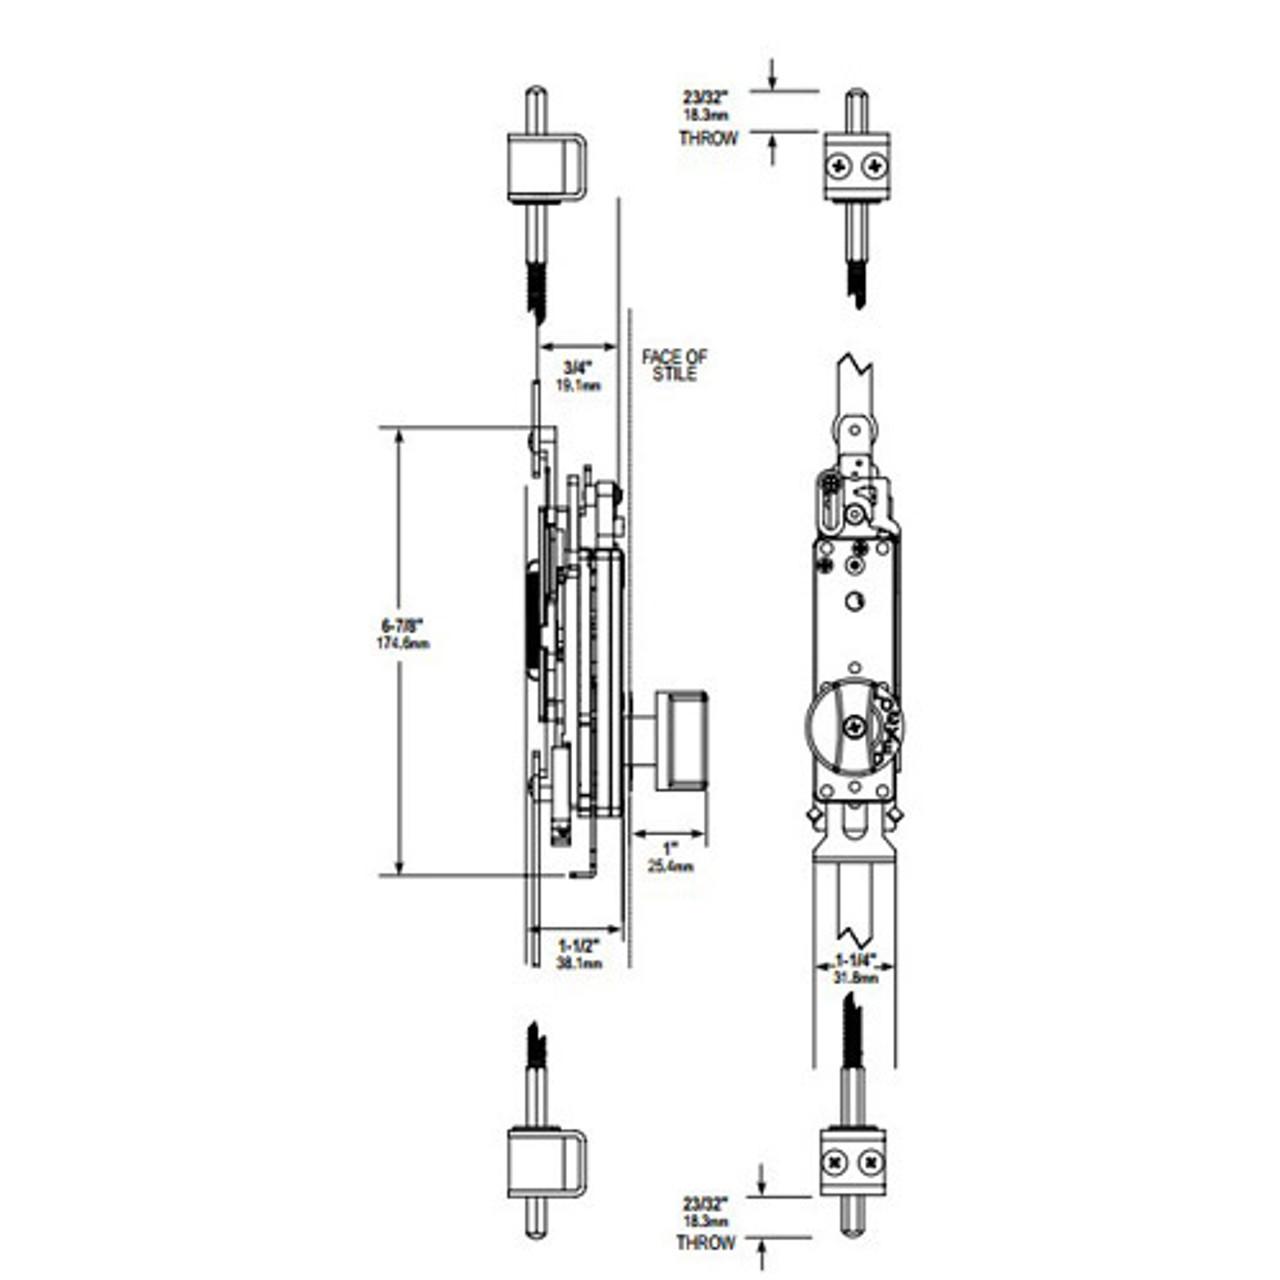 MS2182-10-130 Adams Rite Flushbolt Dimensional View